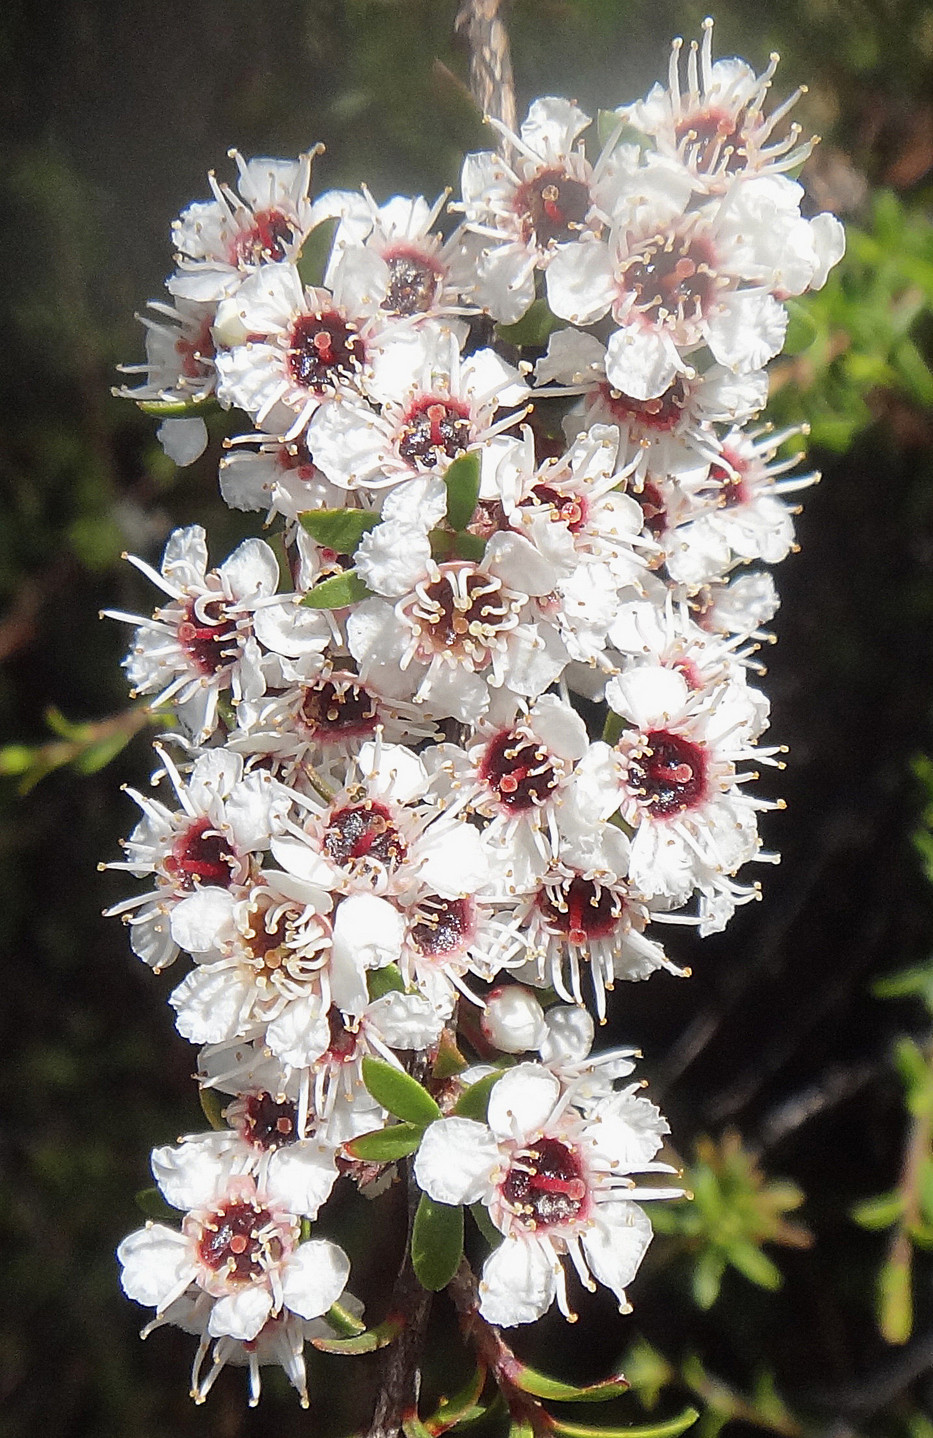 Yoga Flower Growth Strength